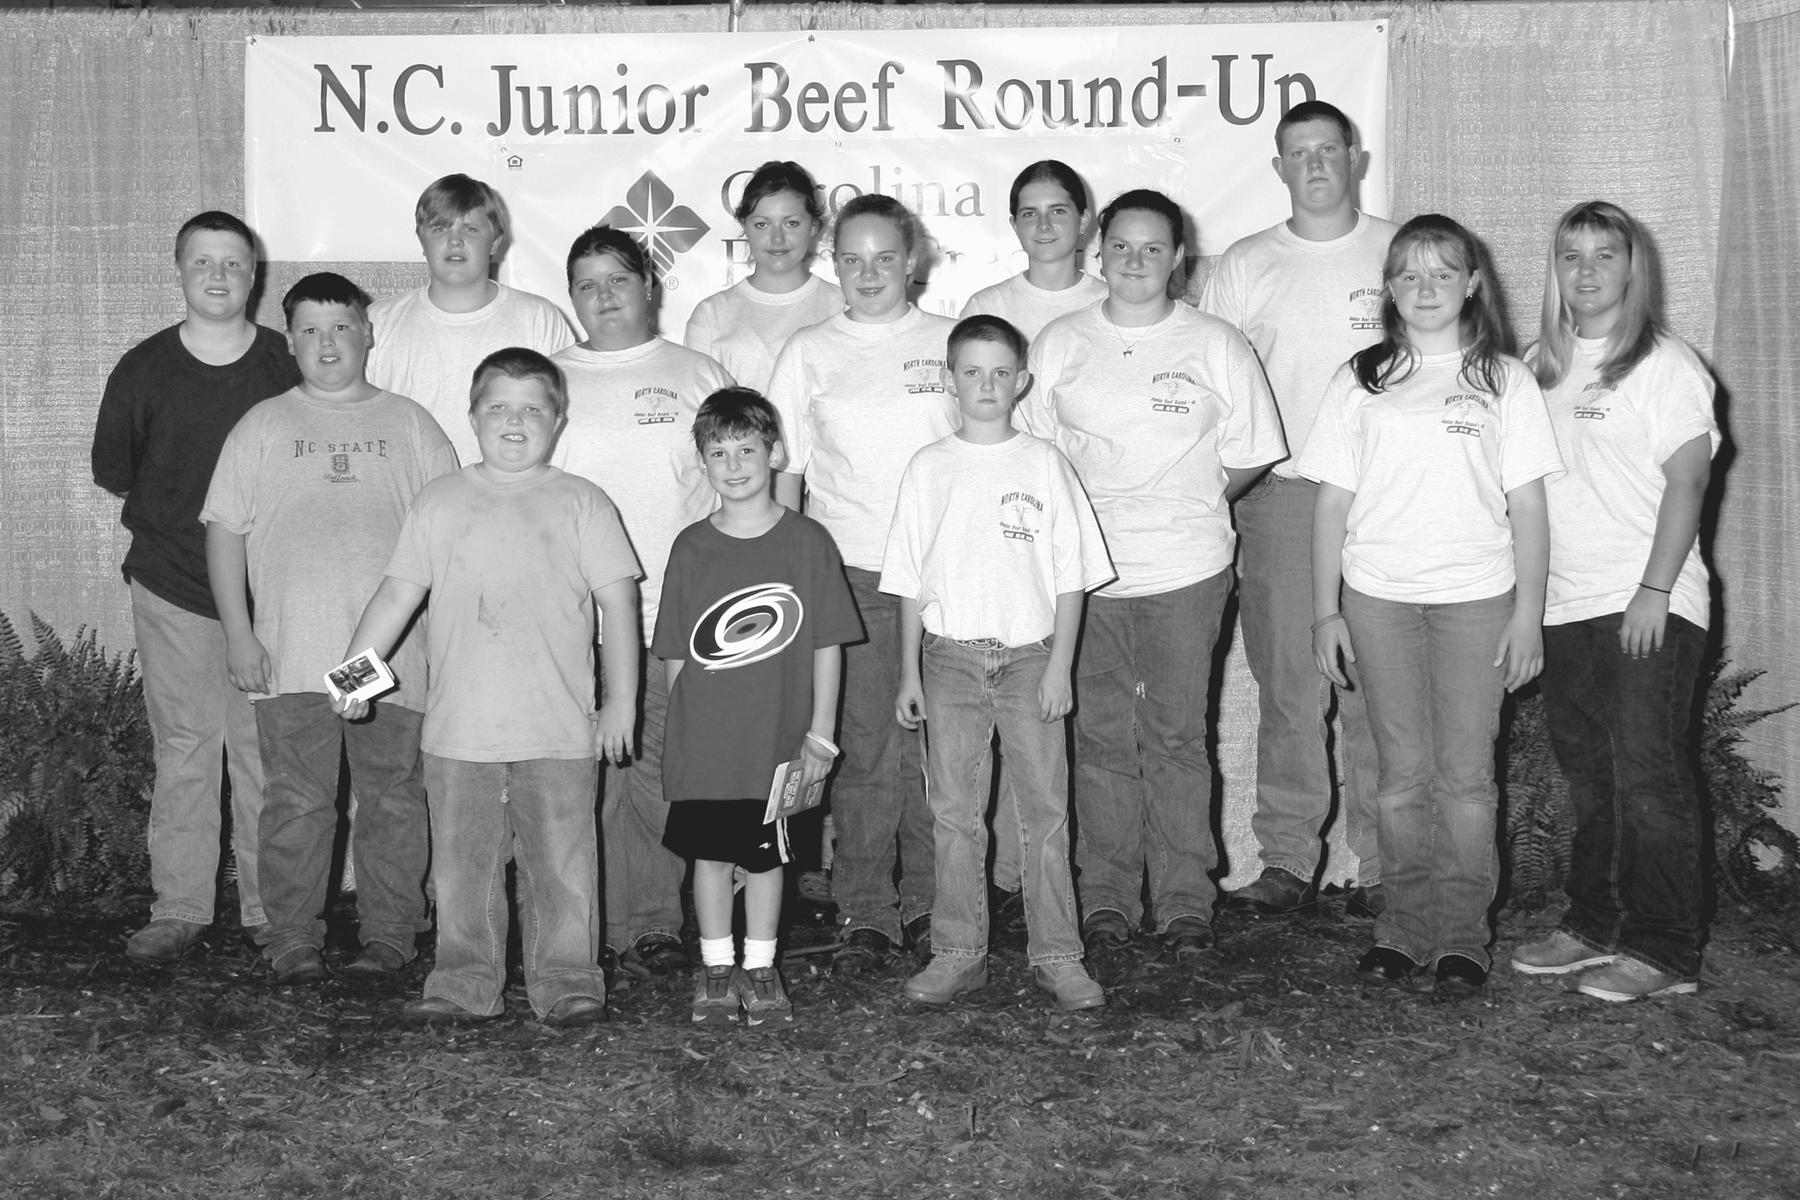 N.C. Junior Beef Round-up participants